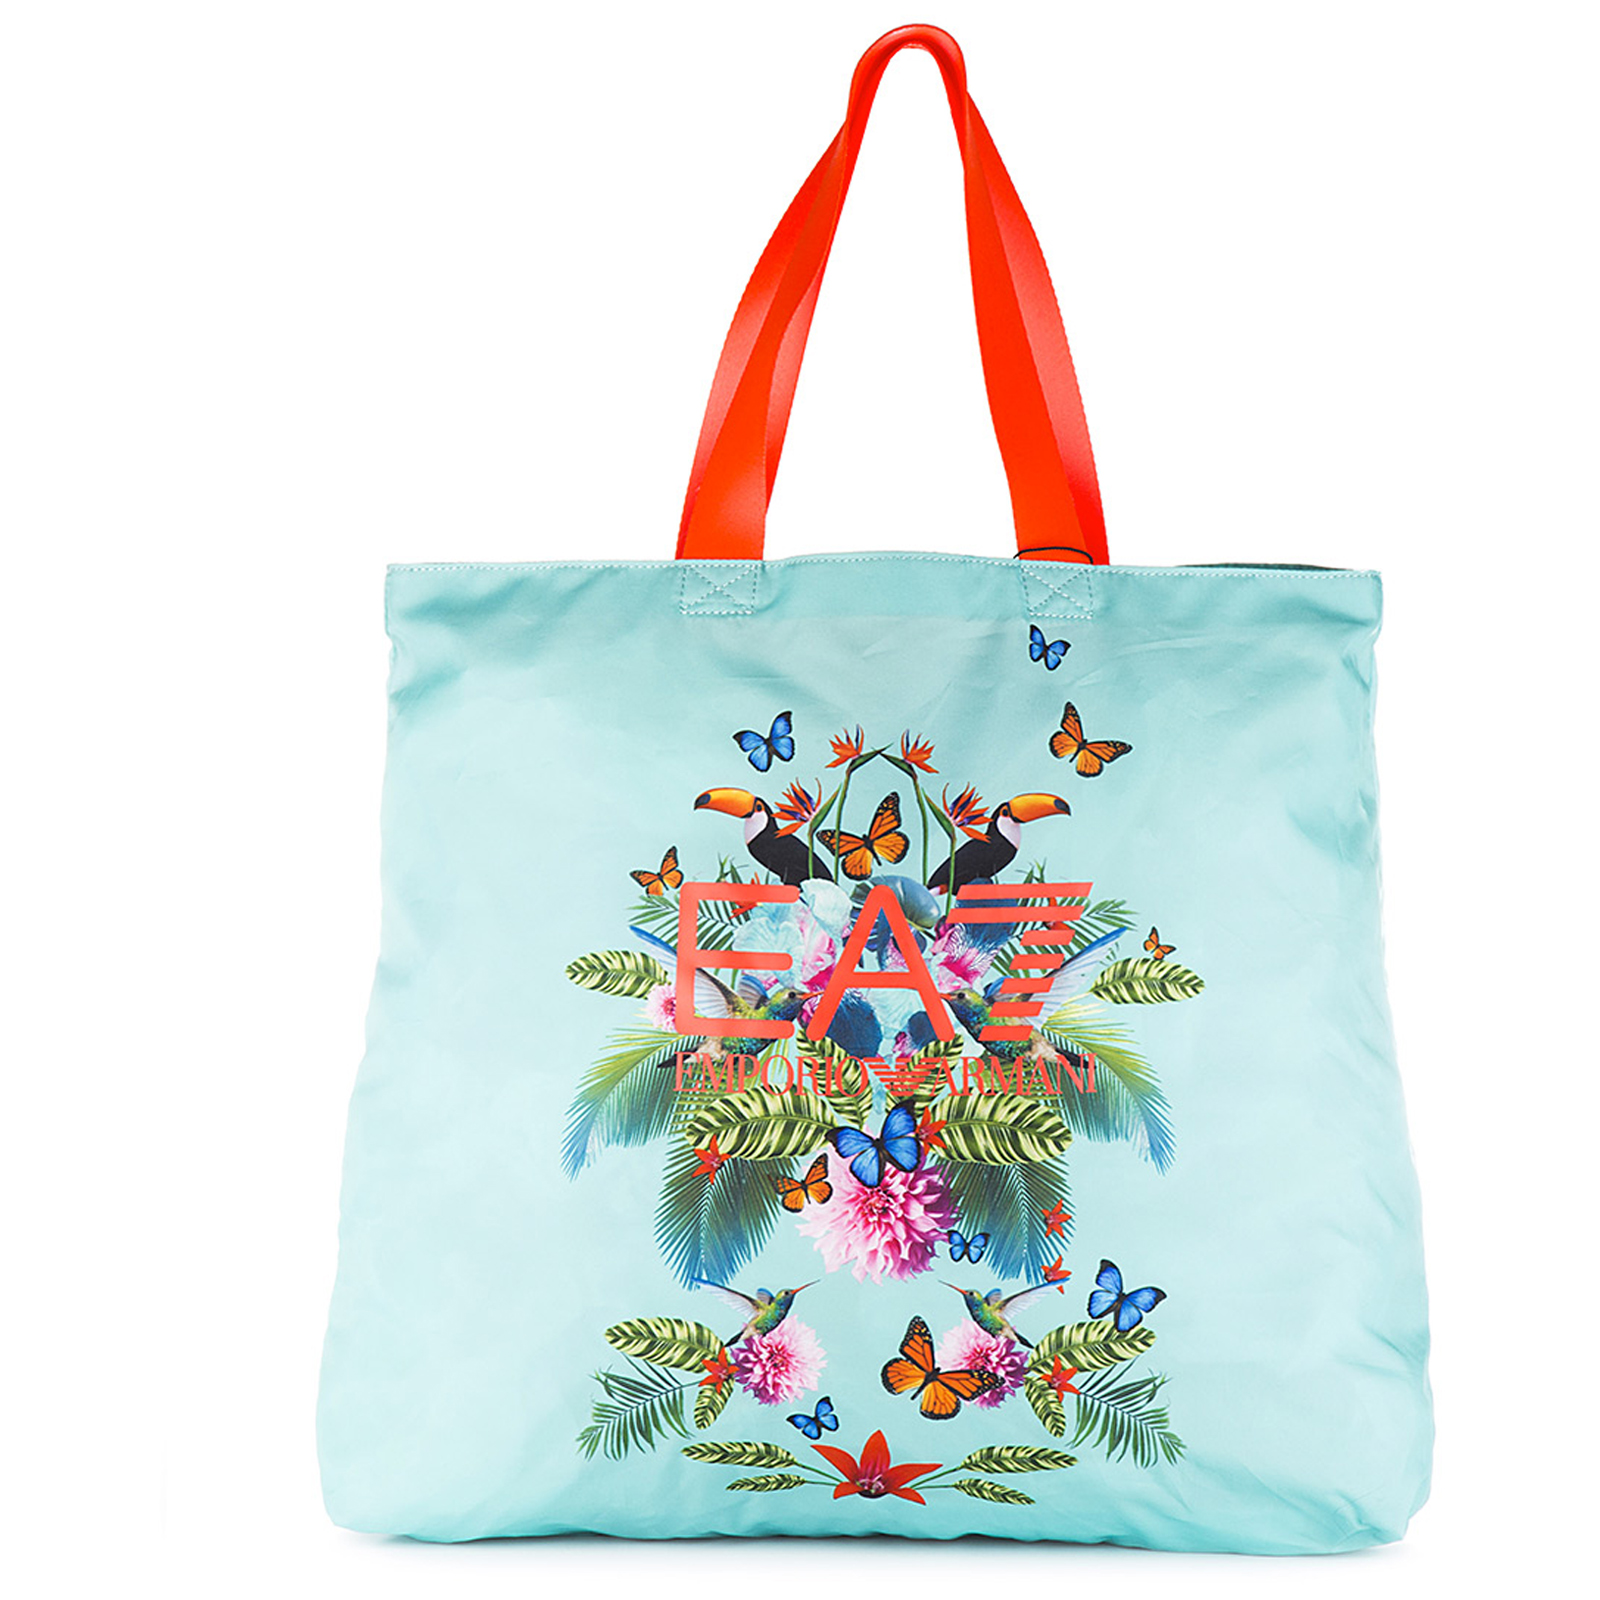 Borsa donna a mano shopping in nylon beach printed